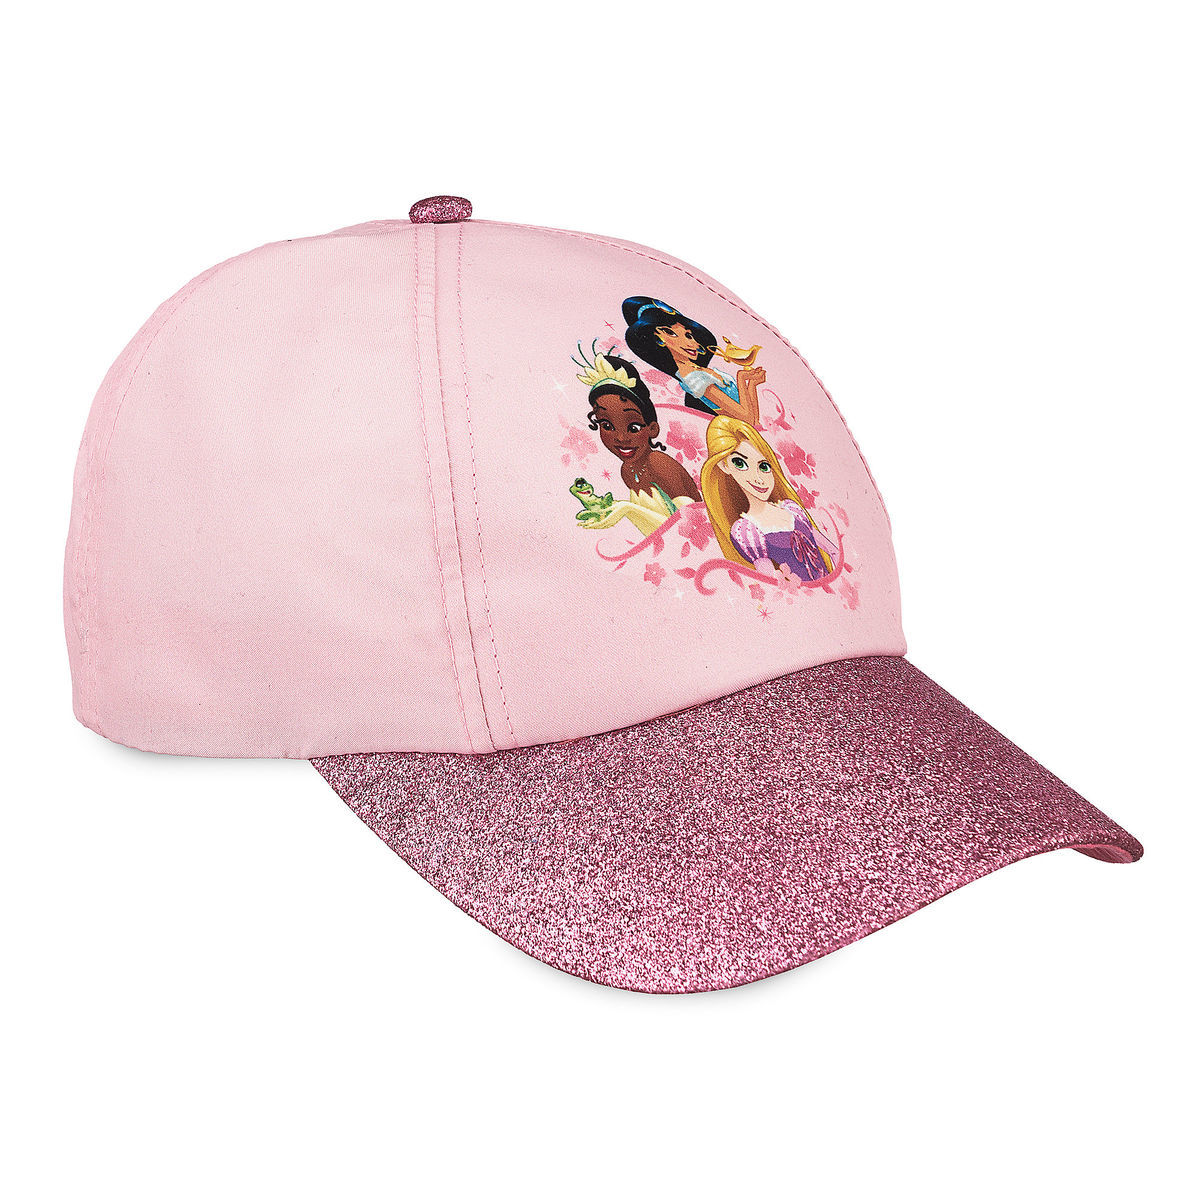 Disney Princess Baseball Cap for Kids  4d9550a74ee7